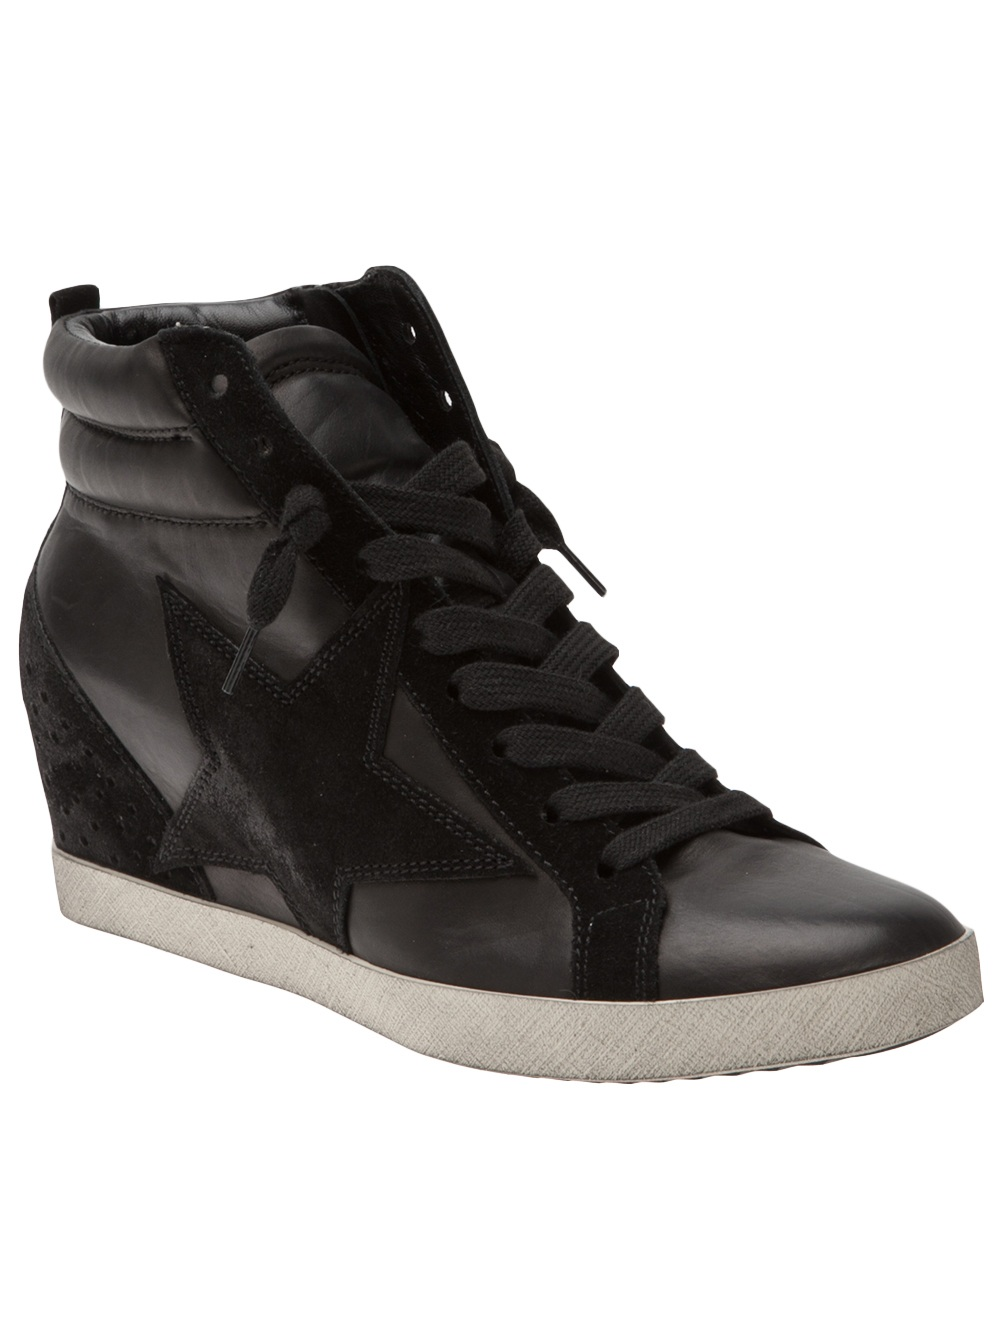 kennel schmenger metro leather wedge sneakers in black lyst. Black Bedroom Furniture Sets. Home Design Ideas